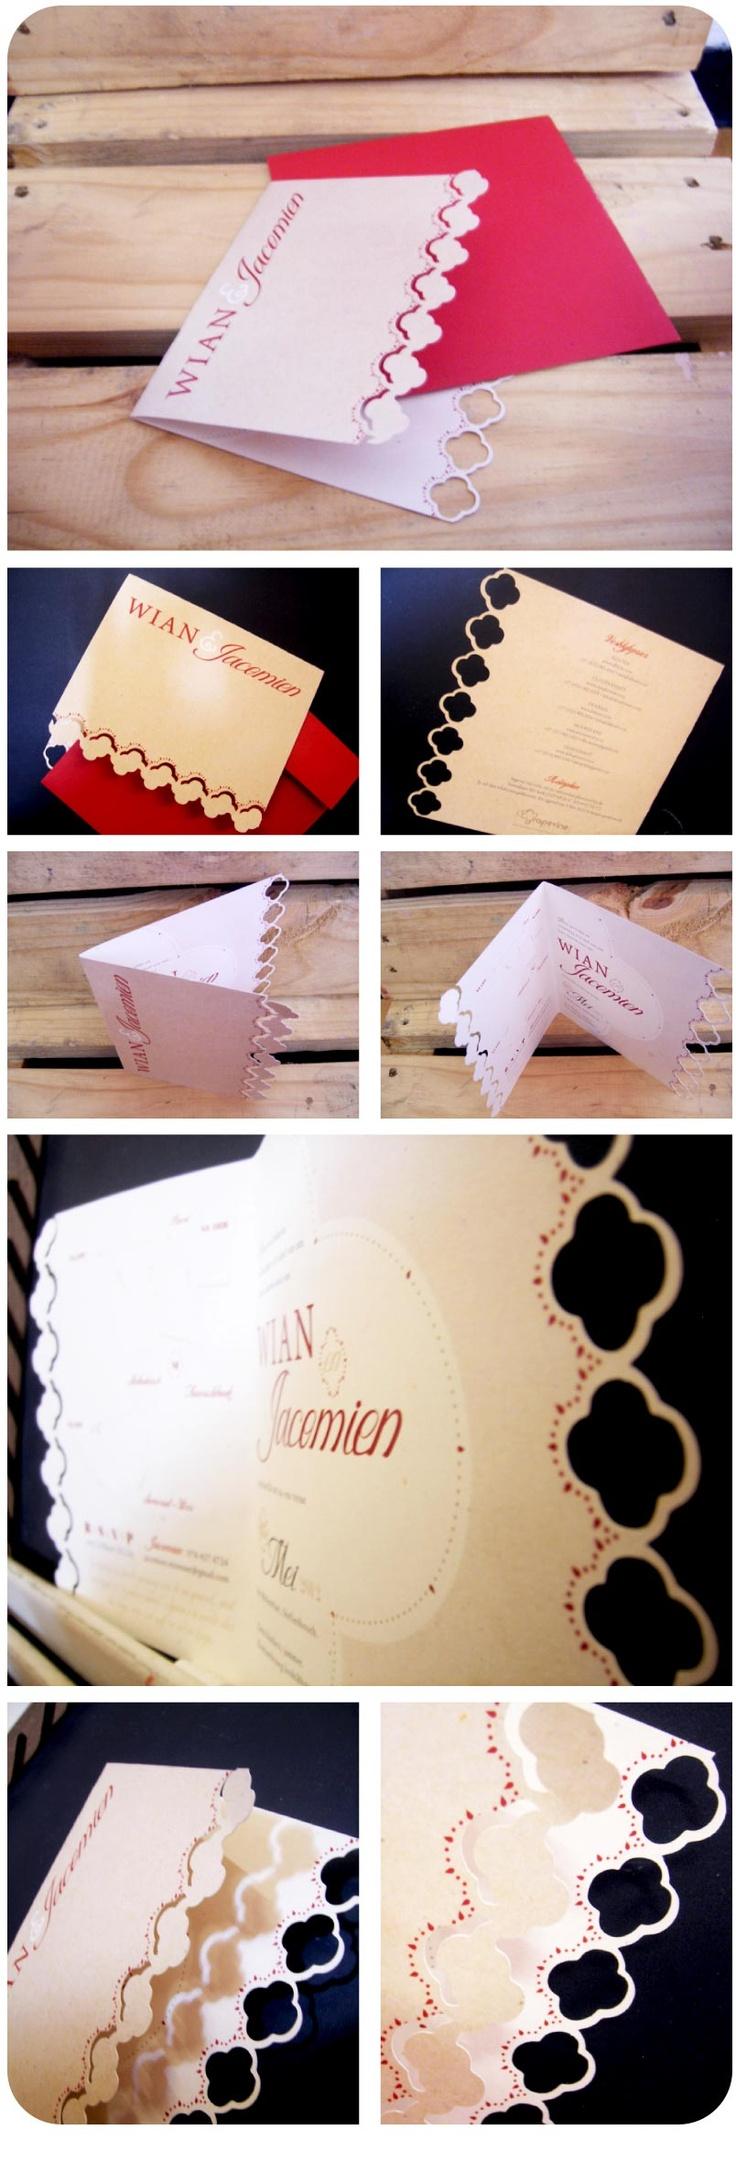 74 best diy handwritten letterscards images on pinterest good grapevine design stationary stationary designhandwritten letterswedding cardinvitation stopboris Choice Image